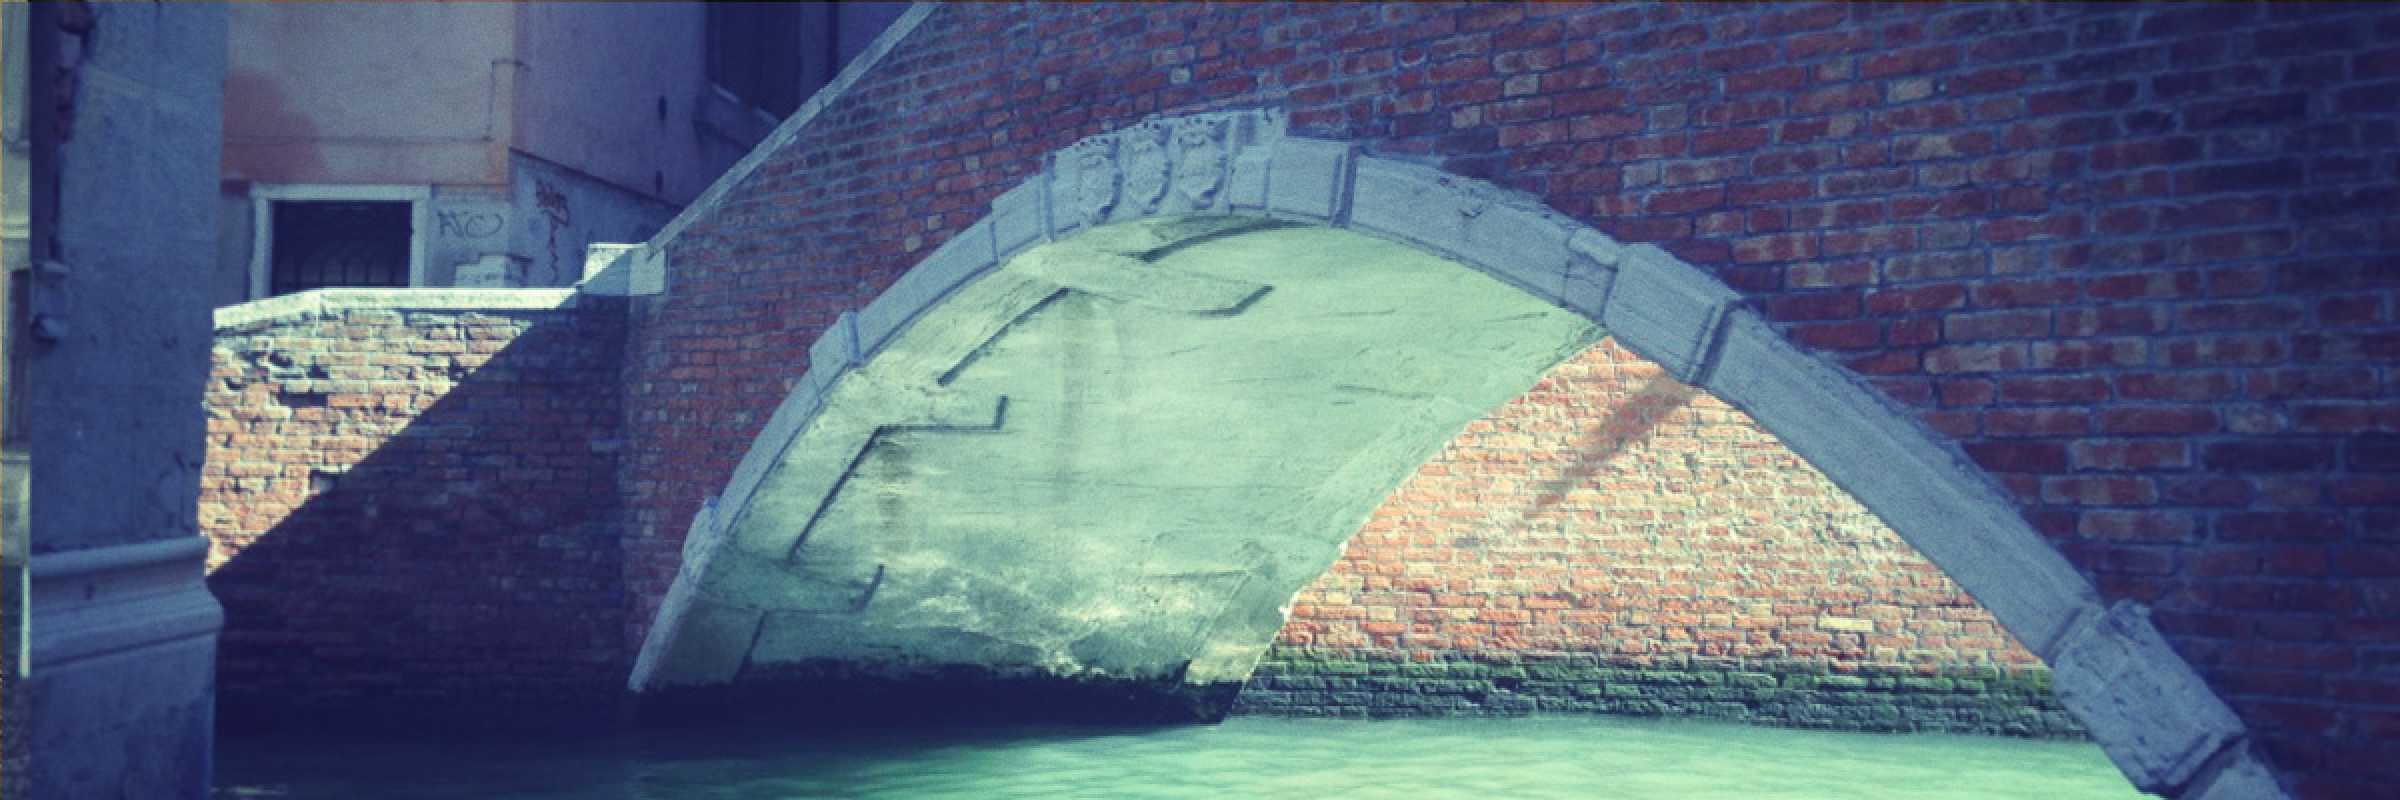 Detail of the crooked bridge in San Marcuola - (Archive Venipedia / Bazzmann)